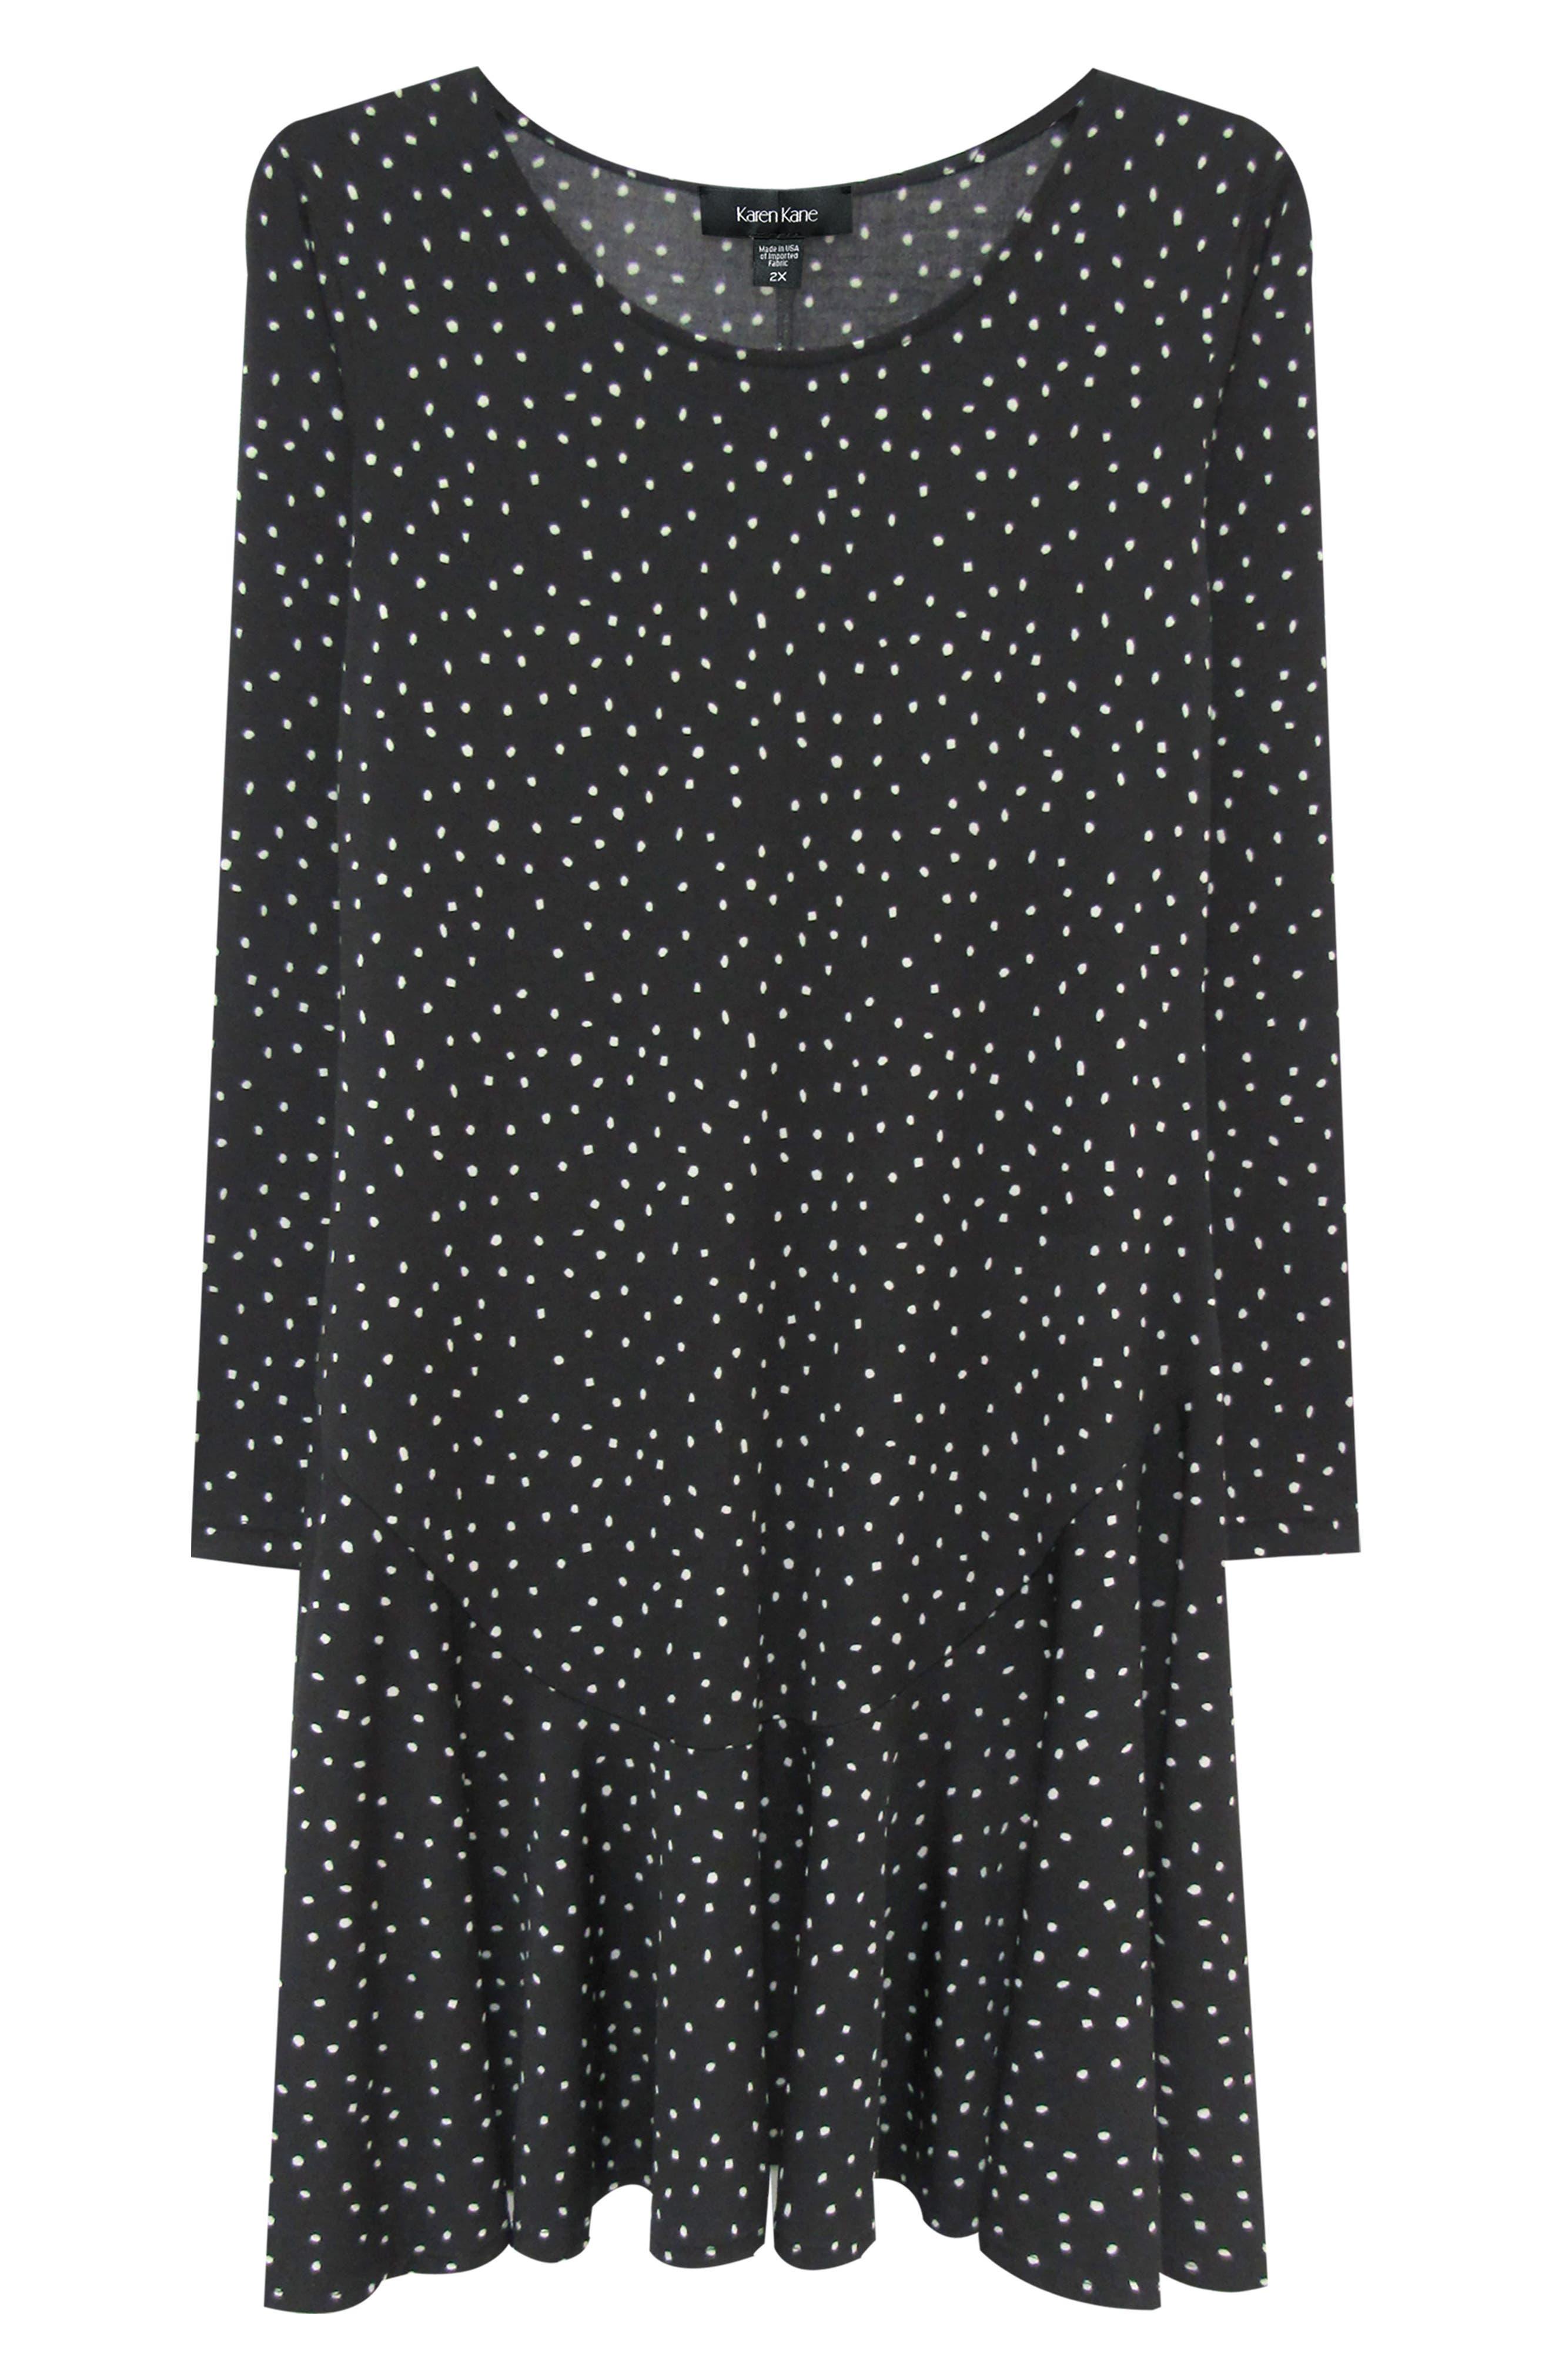 KAREN KANE, Dakota Dot Jersey A-Line Dress, Alternate thumbnail 3, color, DOT